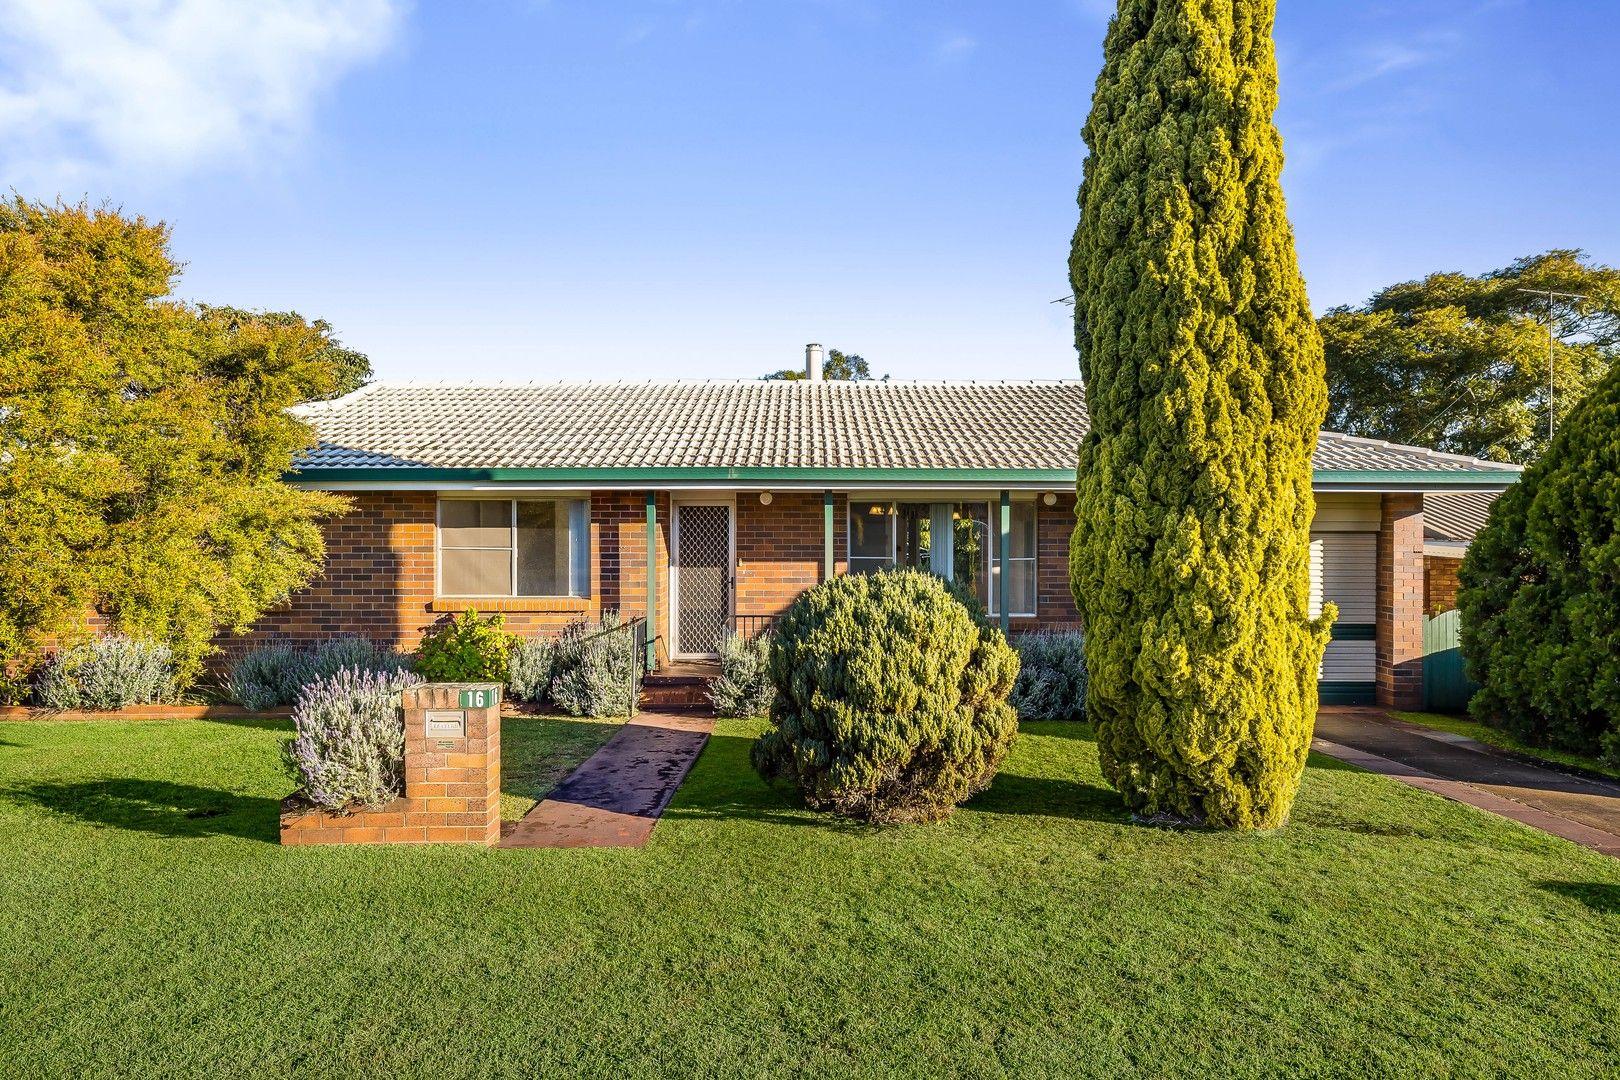 16 Muir Street, Harlaxton QLD 4350, Image 0